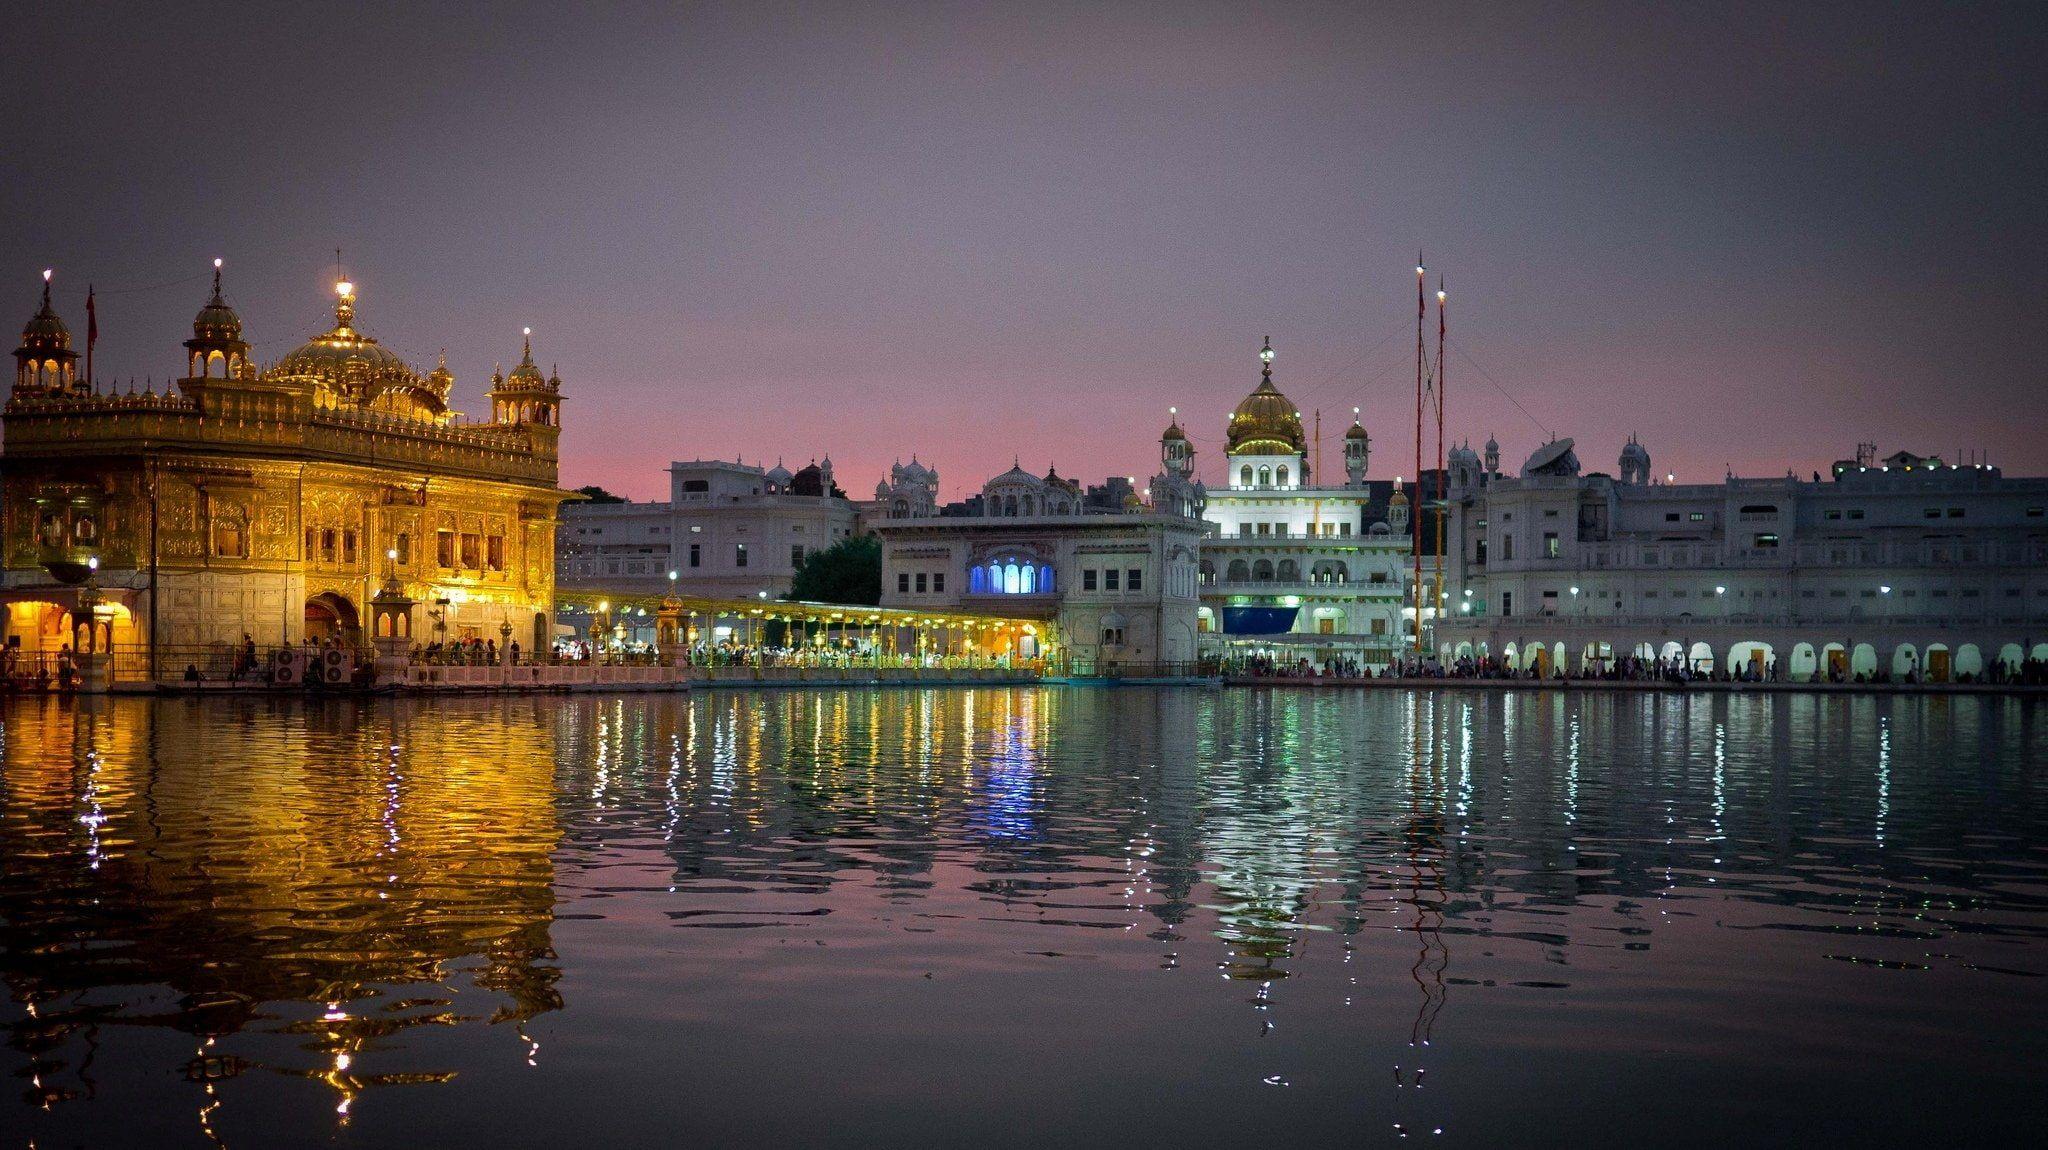 Amritsar India Punjab 1080p Wallpaper Hdwallpaper Desktop Amritsar Harmandir Sahib Punjab